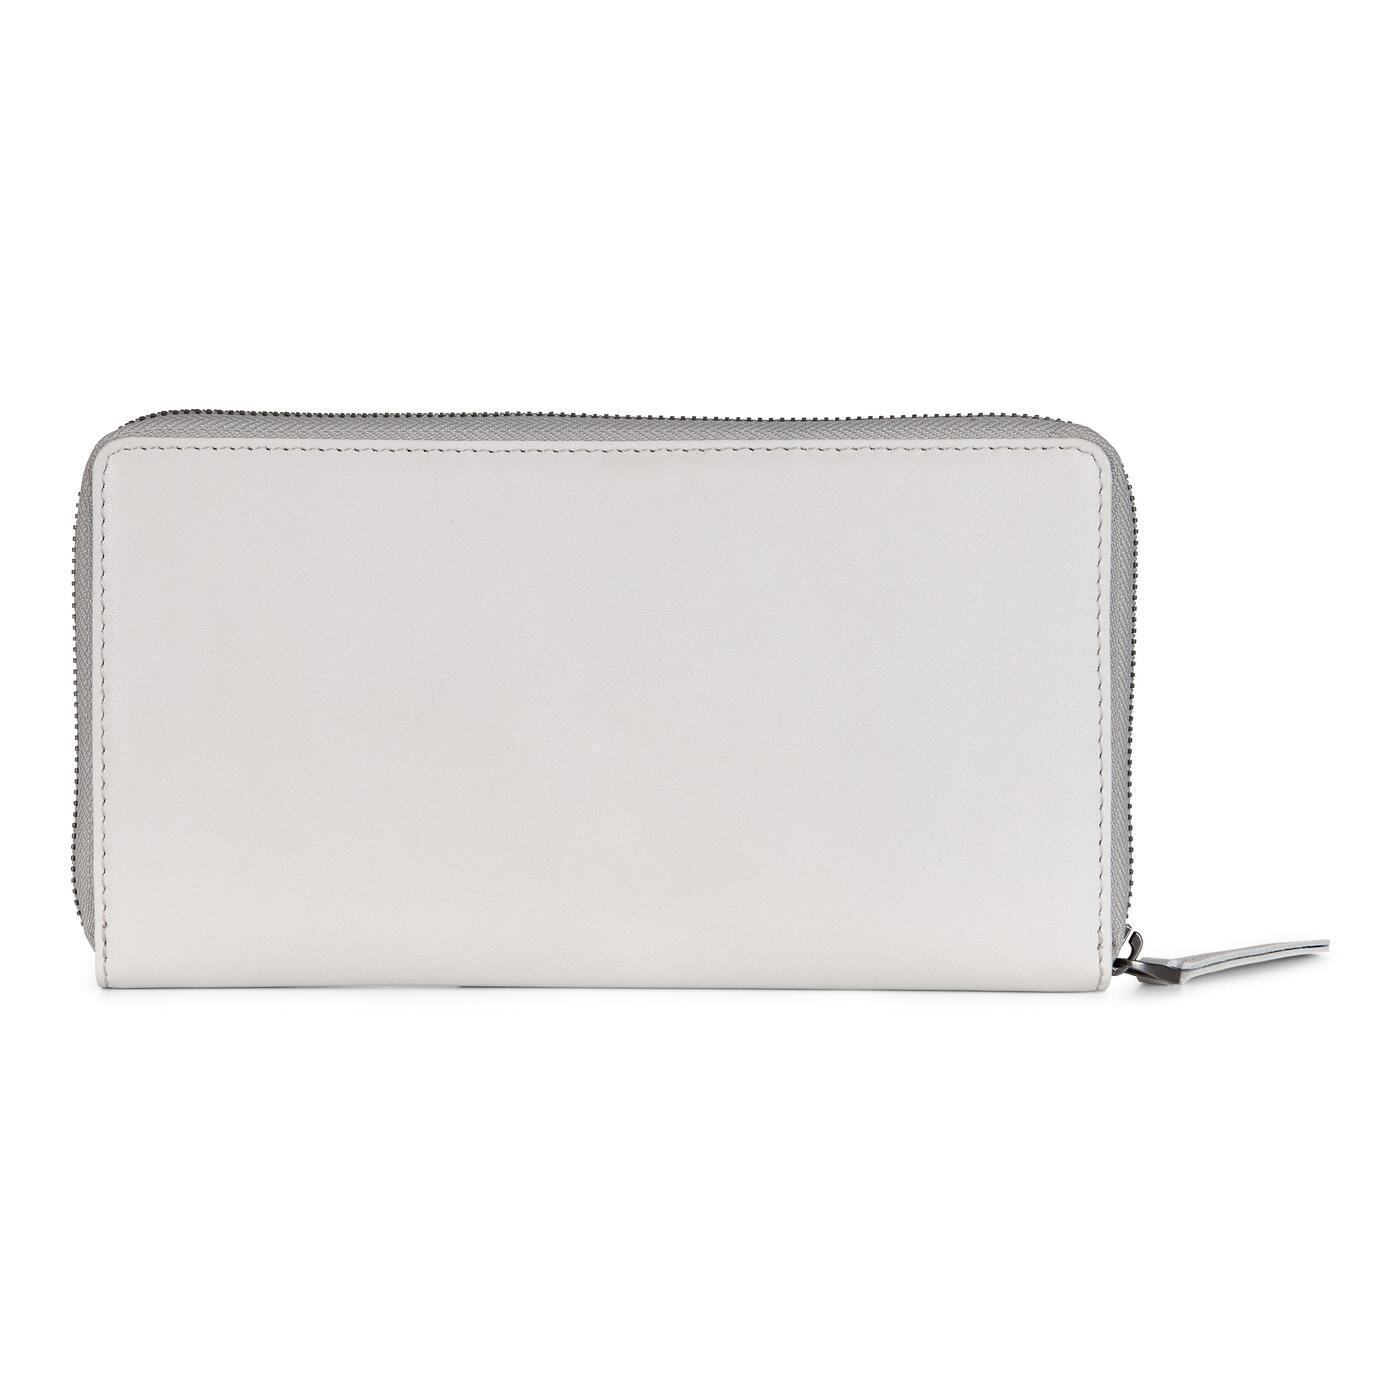 ECCO CASPER Travel Wallet Soft Leather